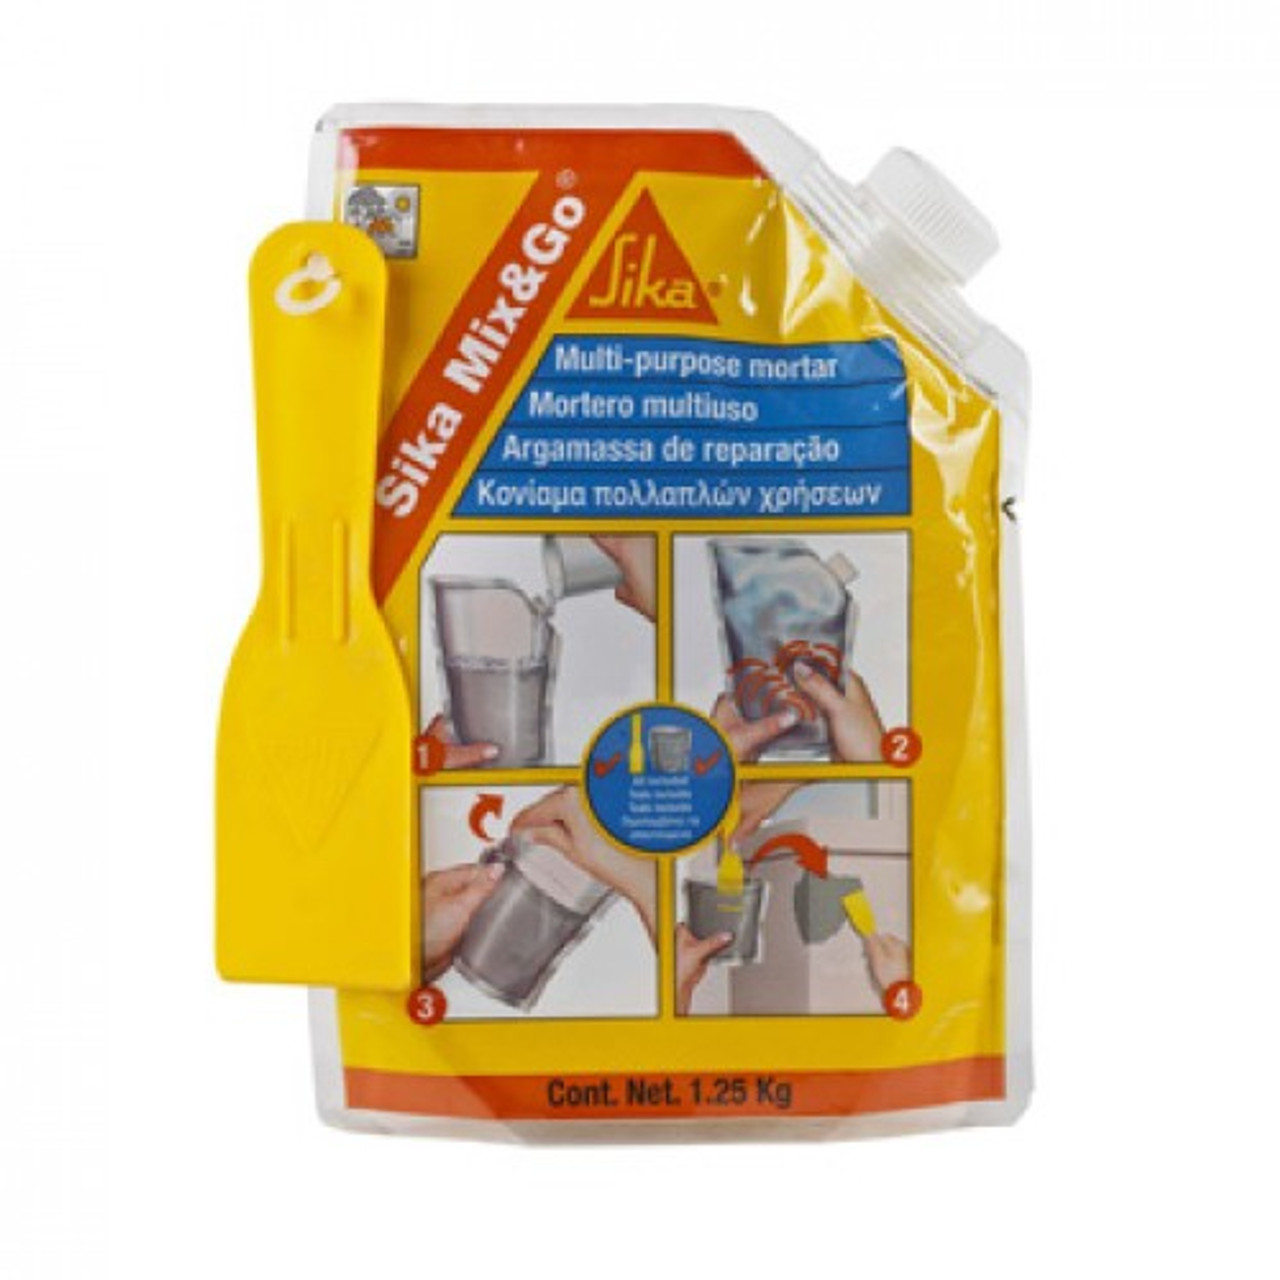 Sika MIX & GO Concrete / Mortar Repair 1 25kg | TCO UK